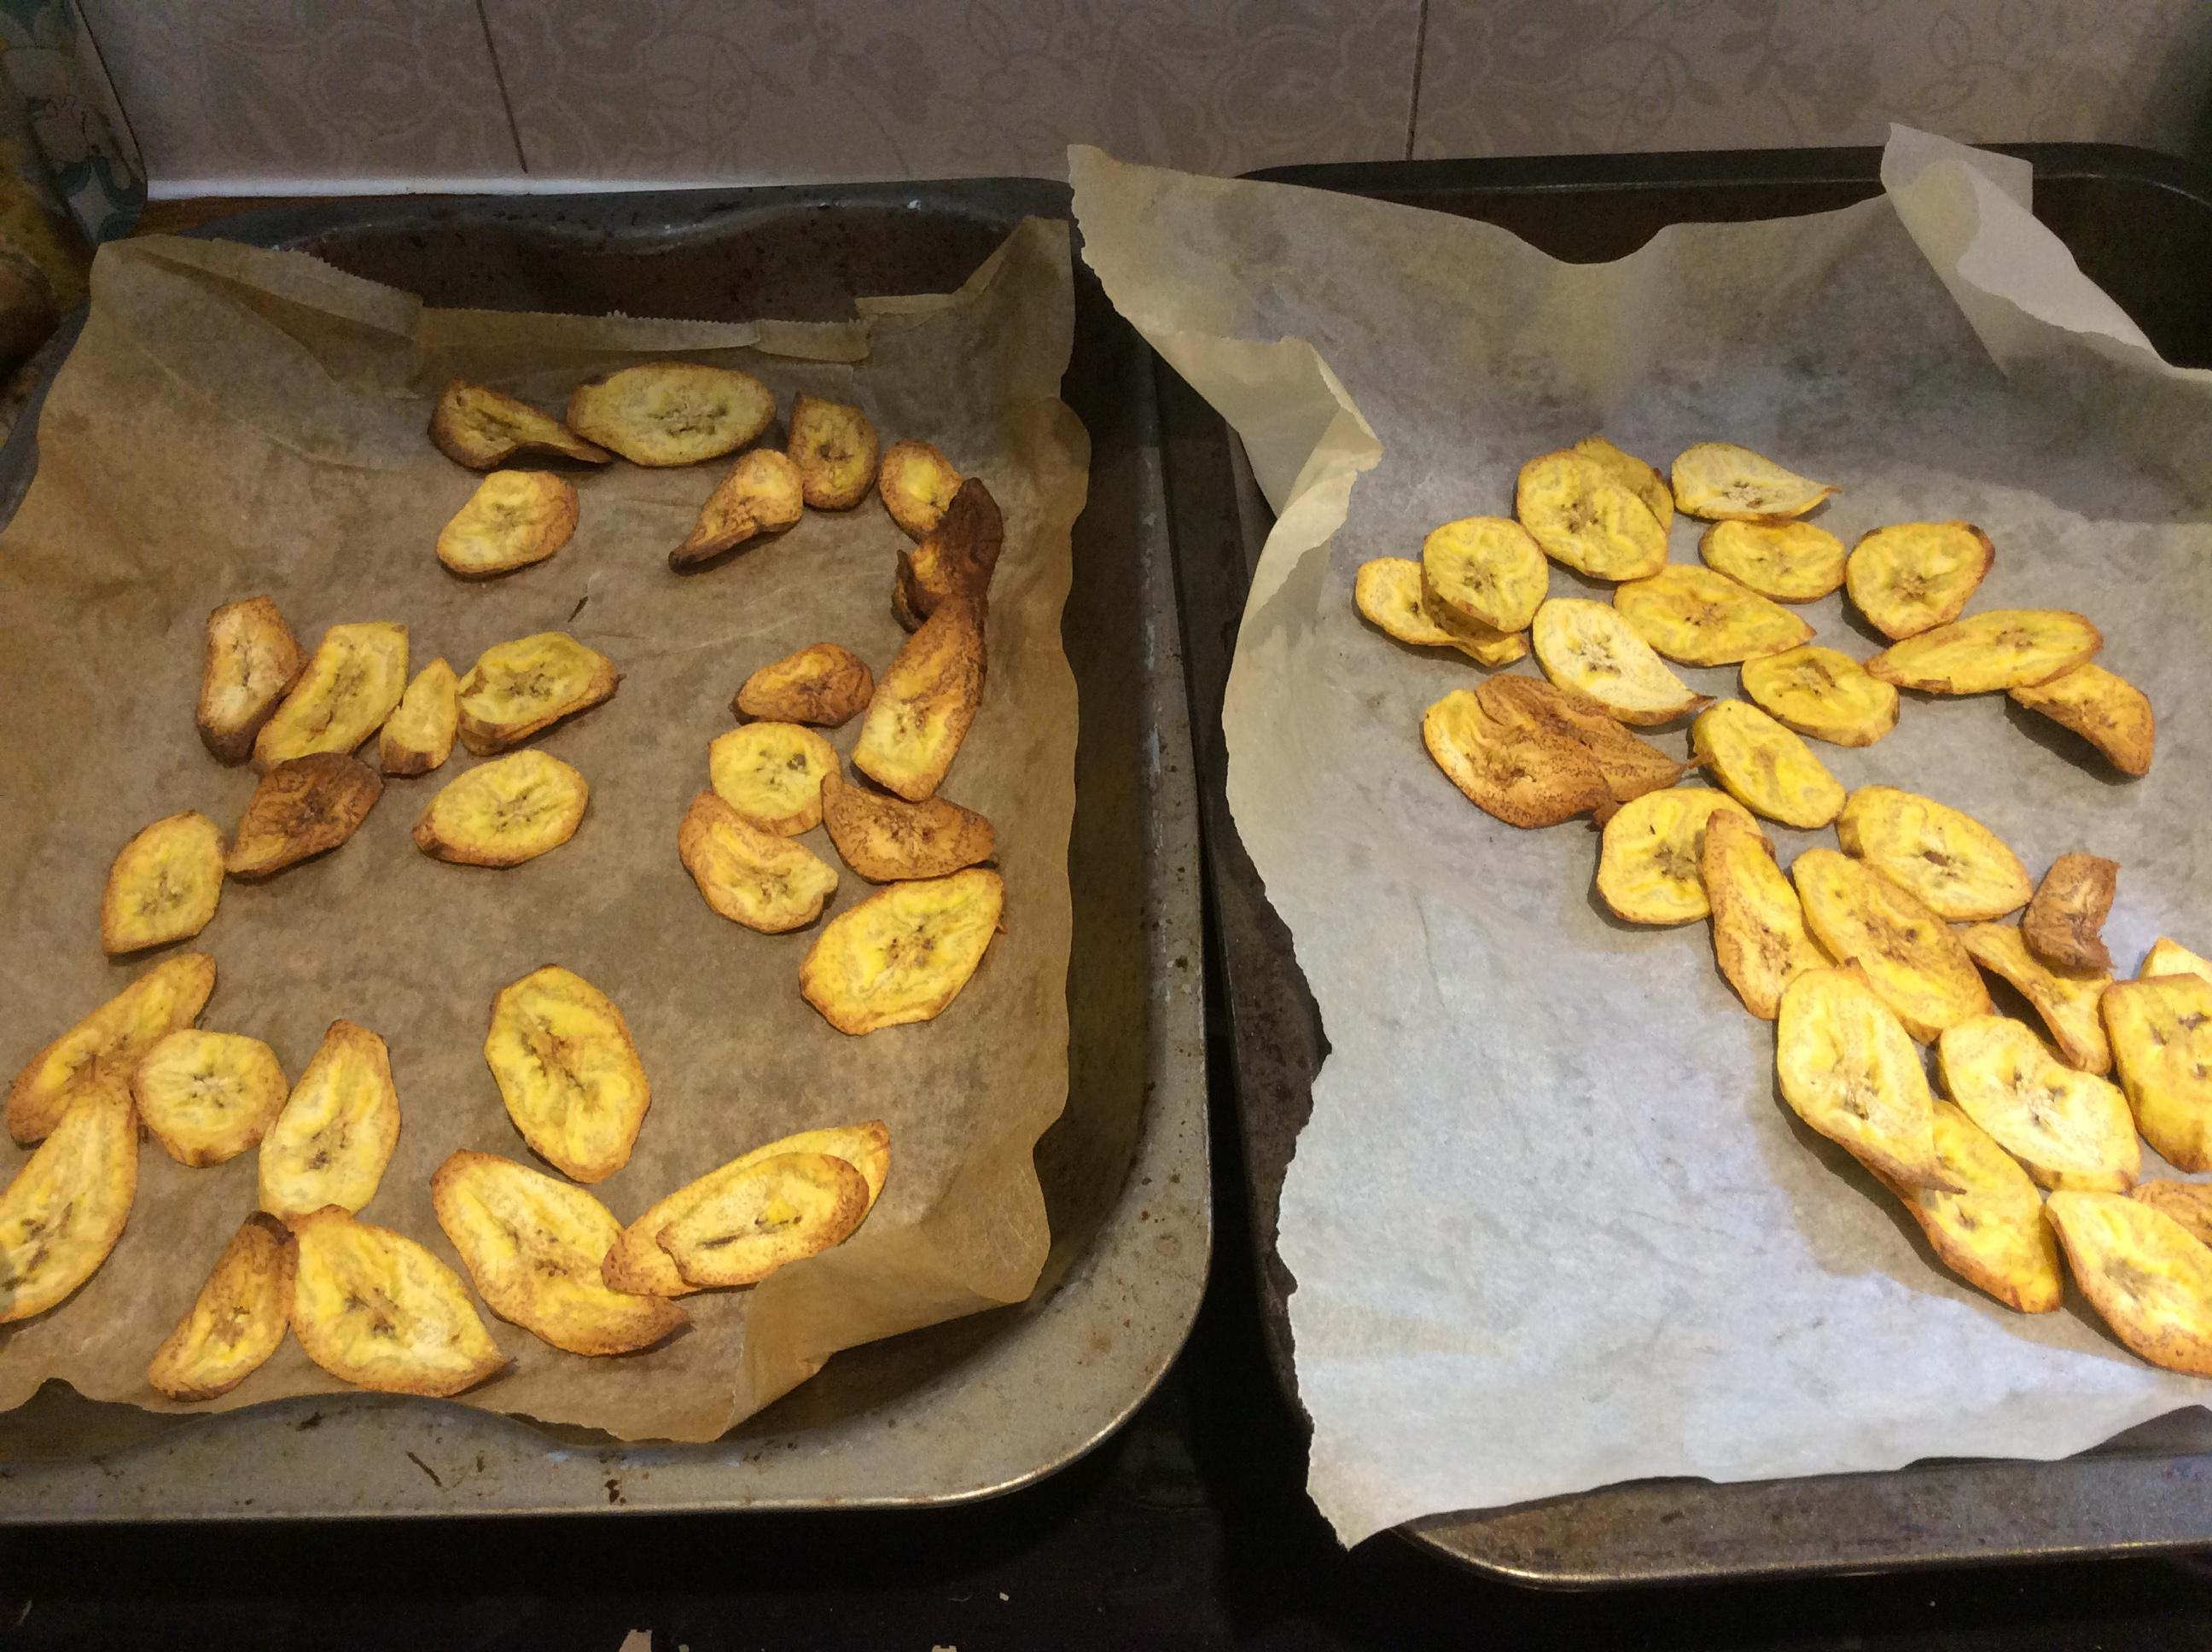 plantain crisps on baking tray